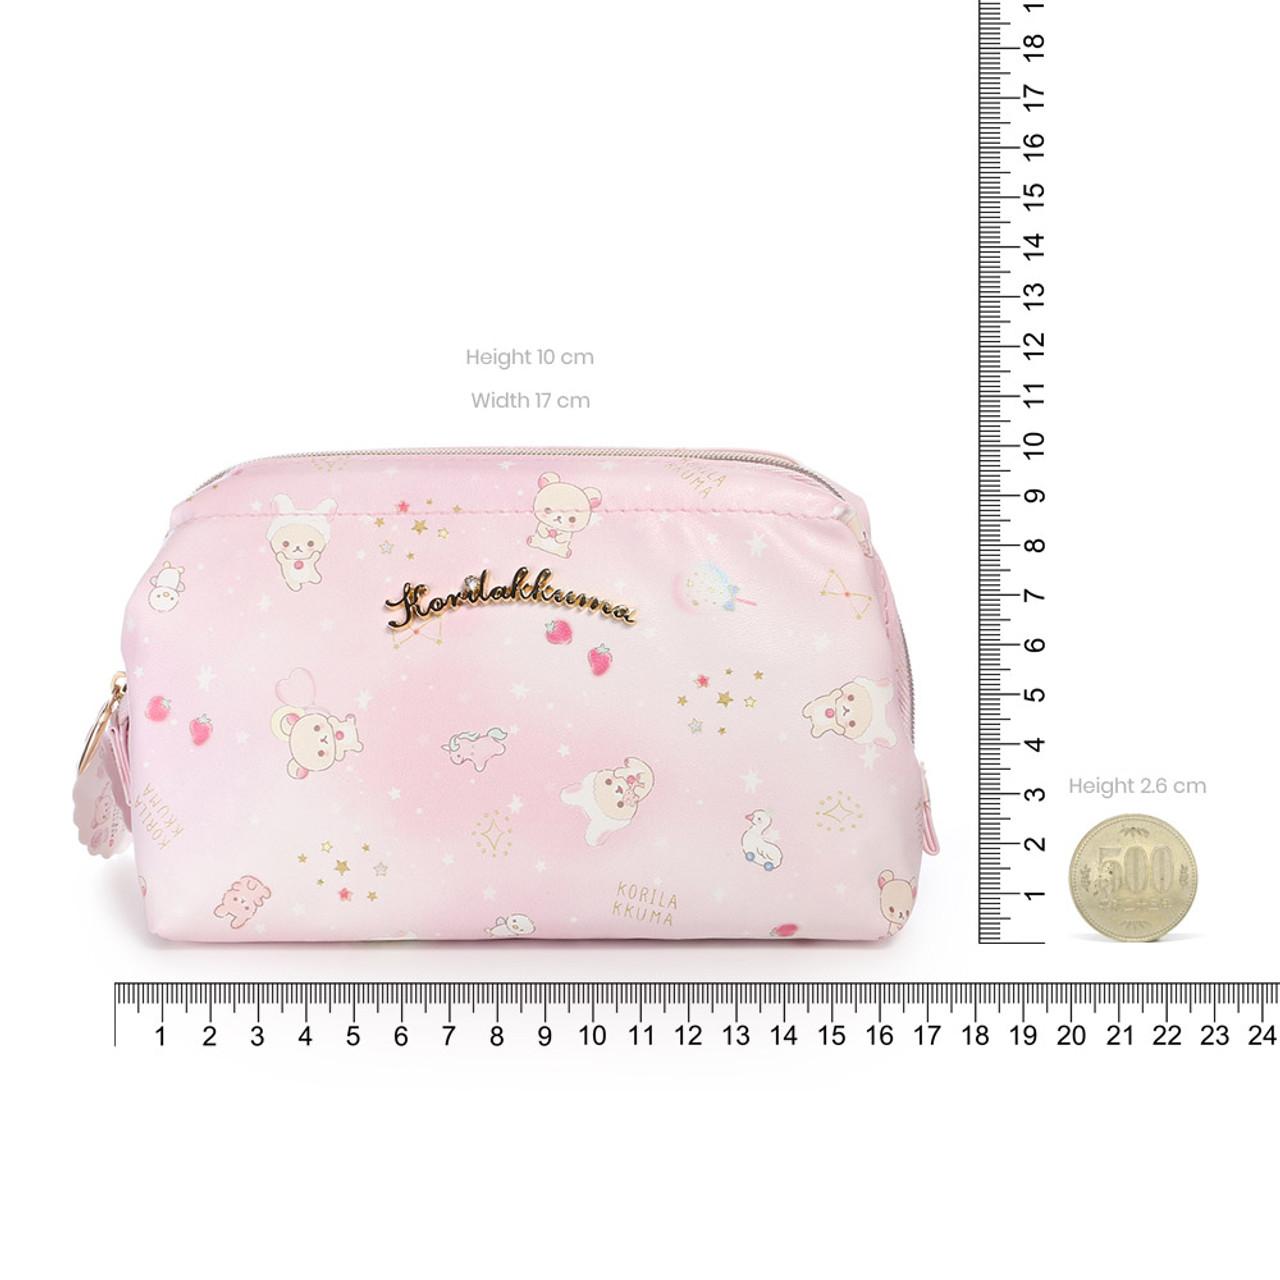 Korilakkuma Pink Fantasty Dream Cosmetic Bag ( Proportion )